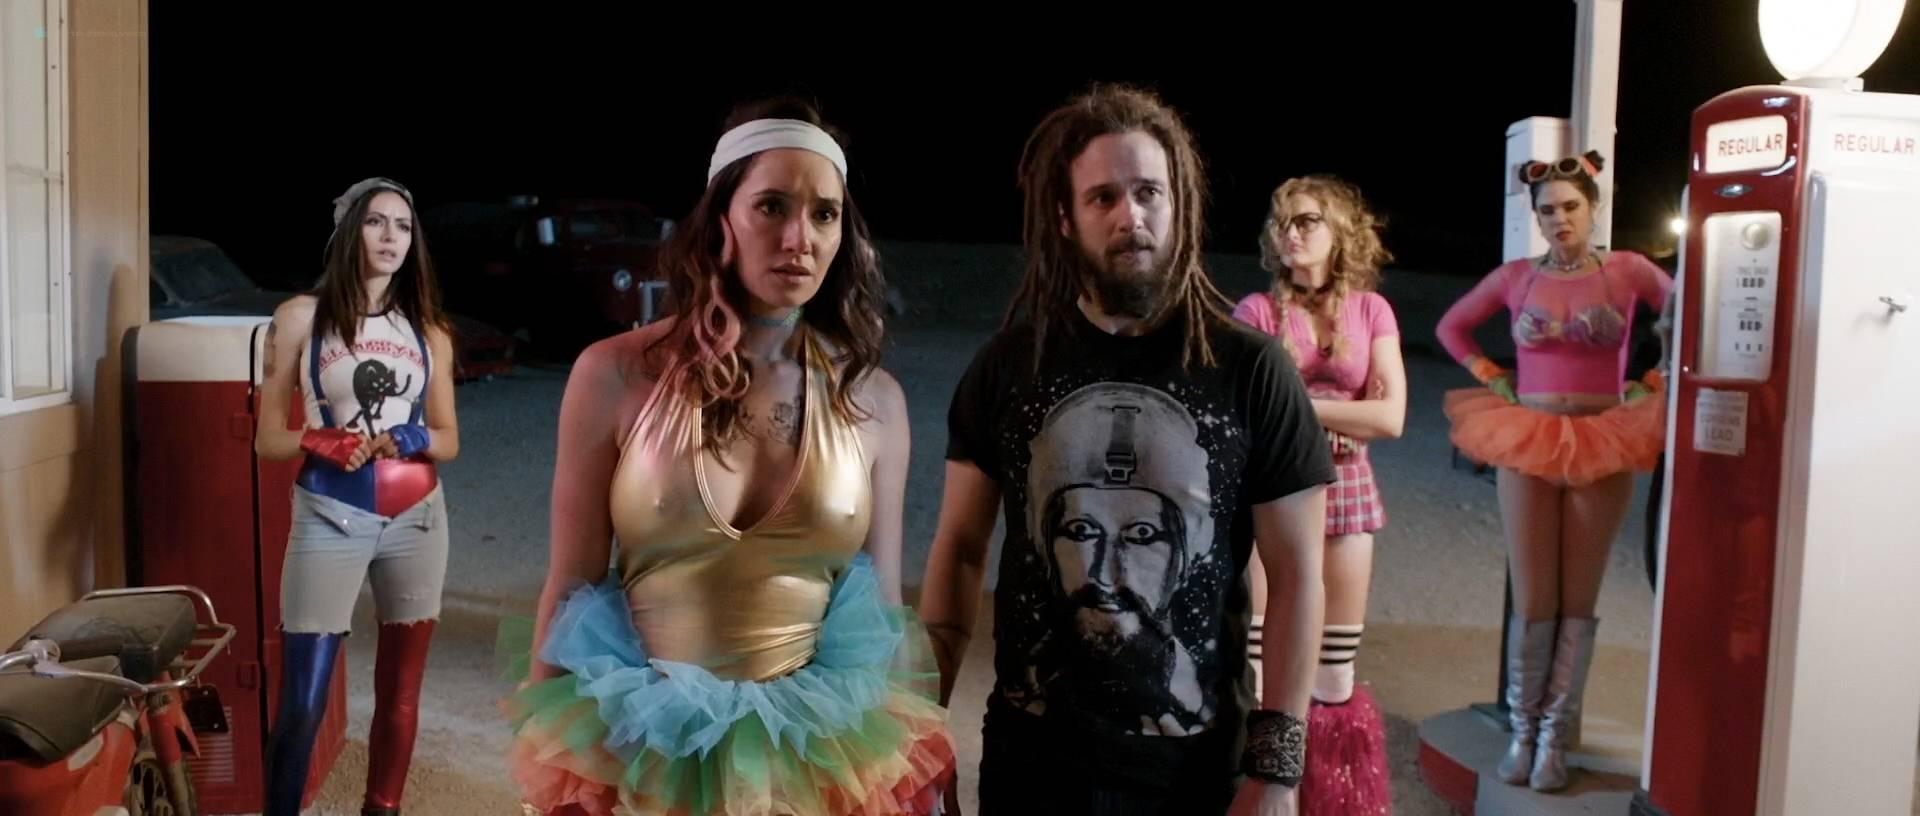 Sara-Malakul-Lane-nude-toples-Kelly-McCart-and-Amanda-Ruth-Ritchie-nude-too-Halloween-Pussy-Trap-Kill-Kill-2017-HD-1080p-Web-005.jpg